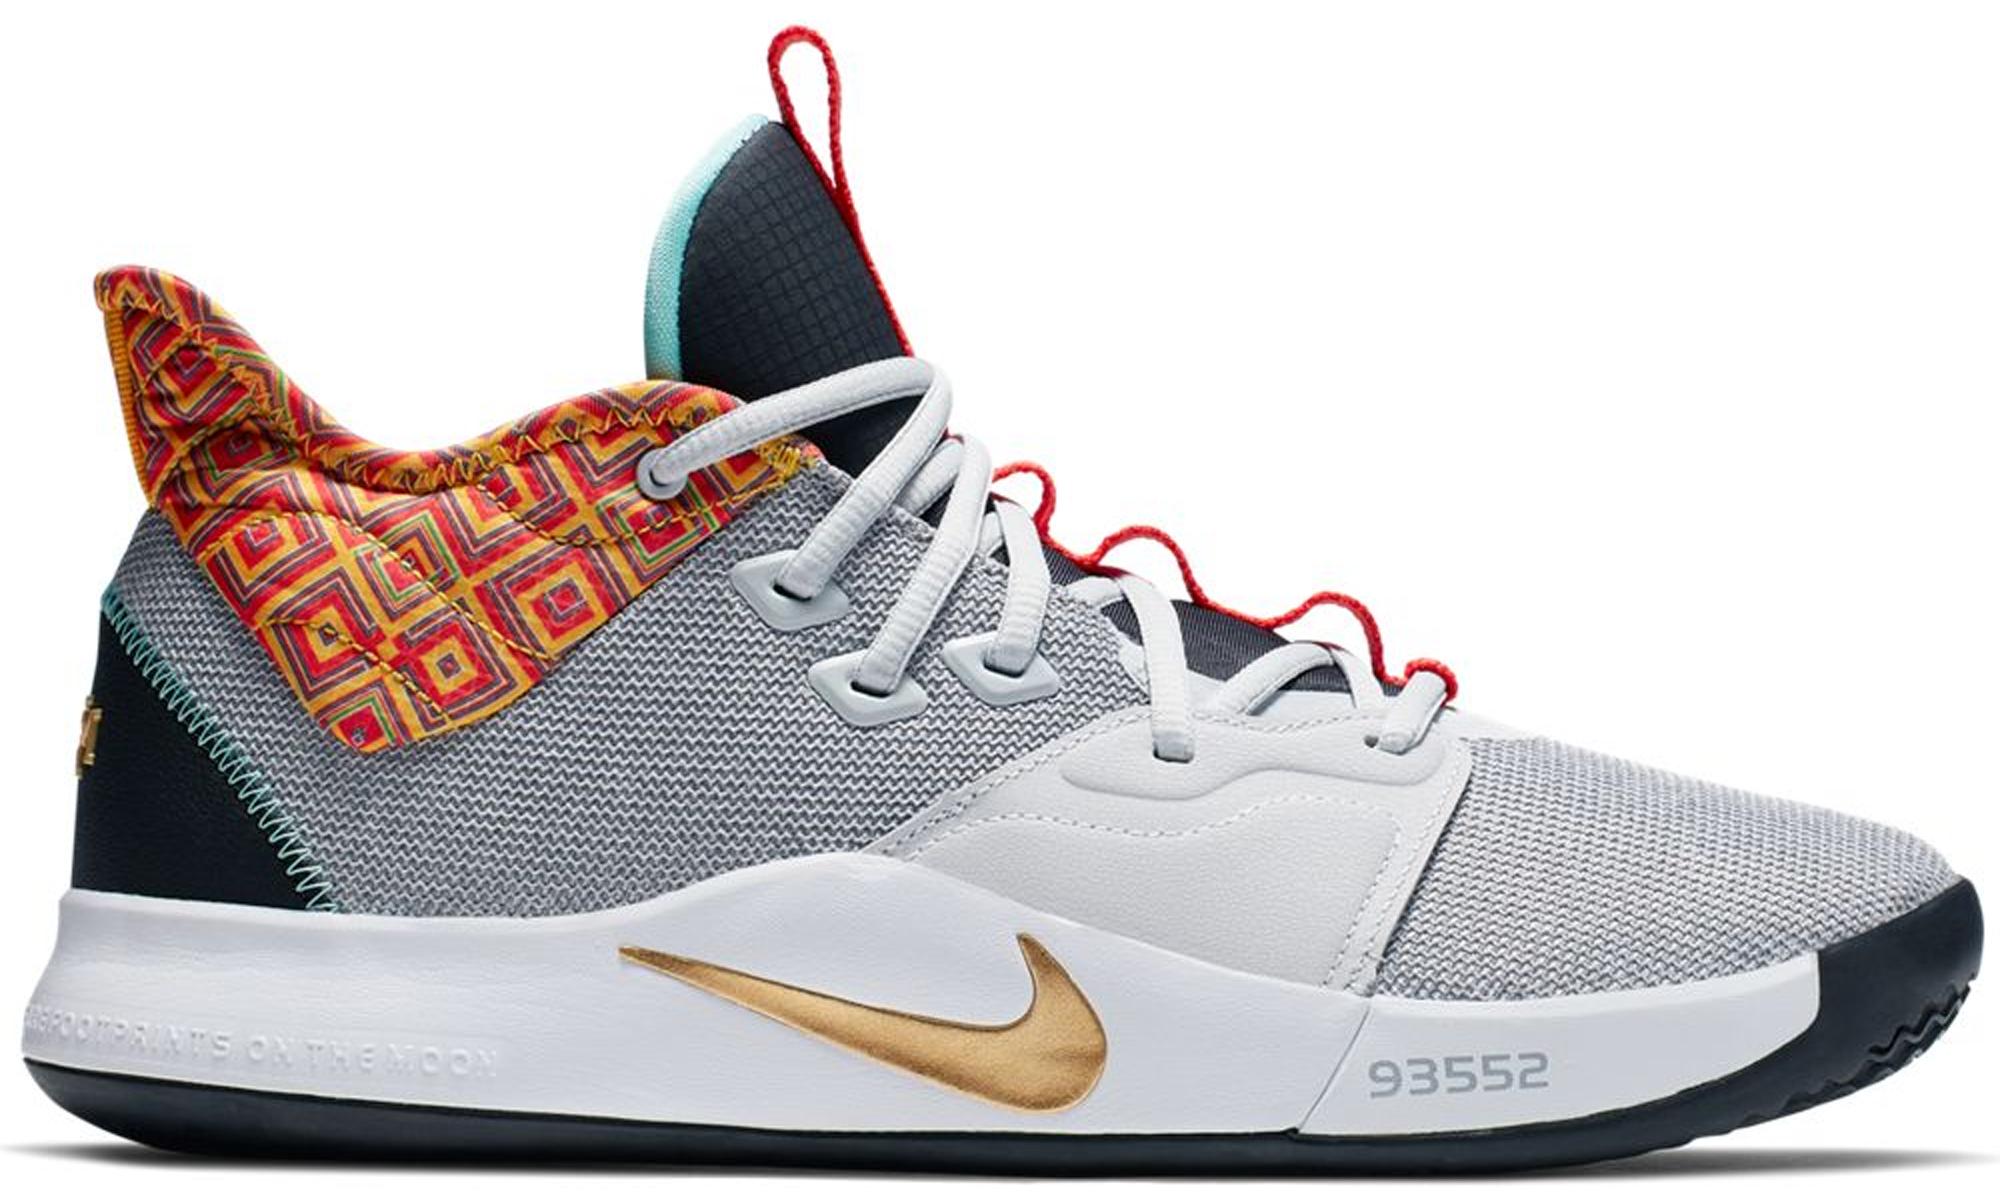 Nike PG 3 BHM (2019)